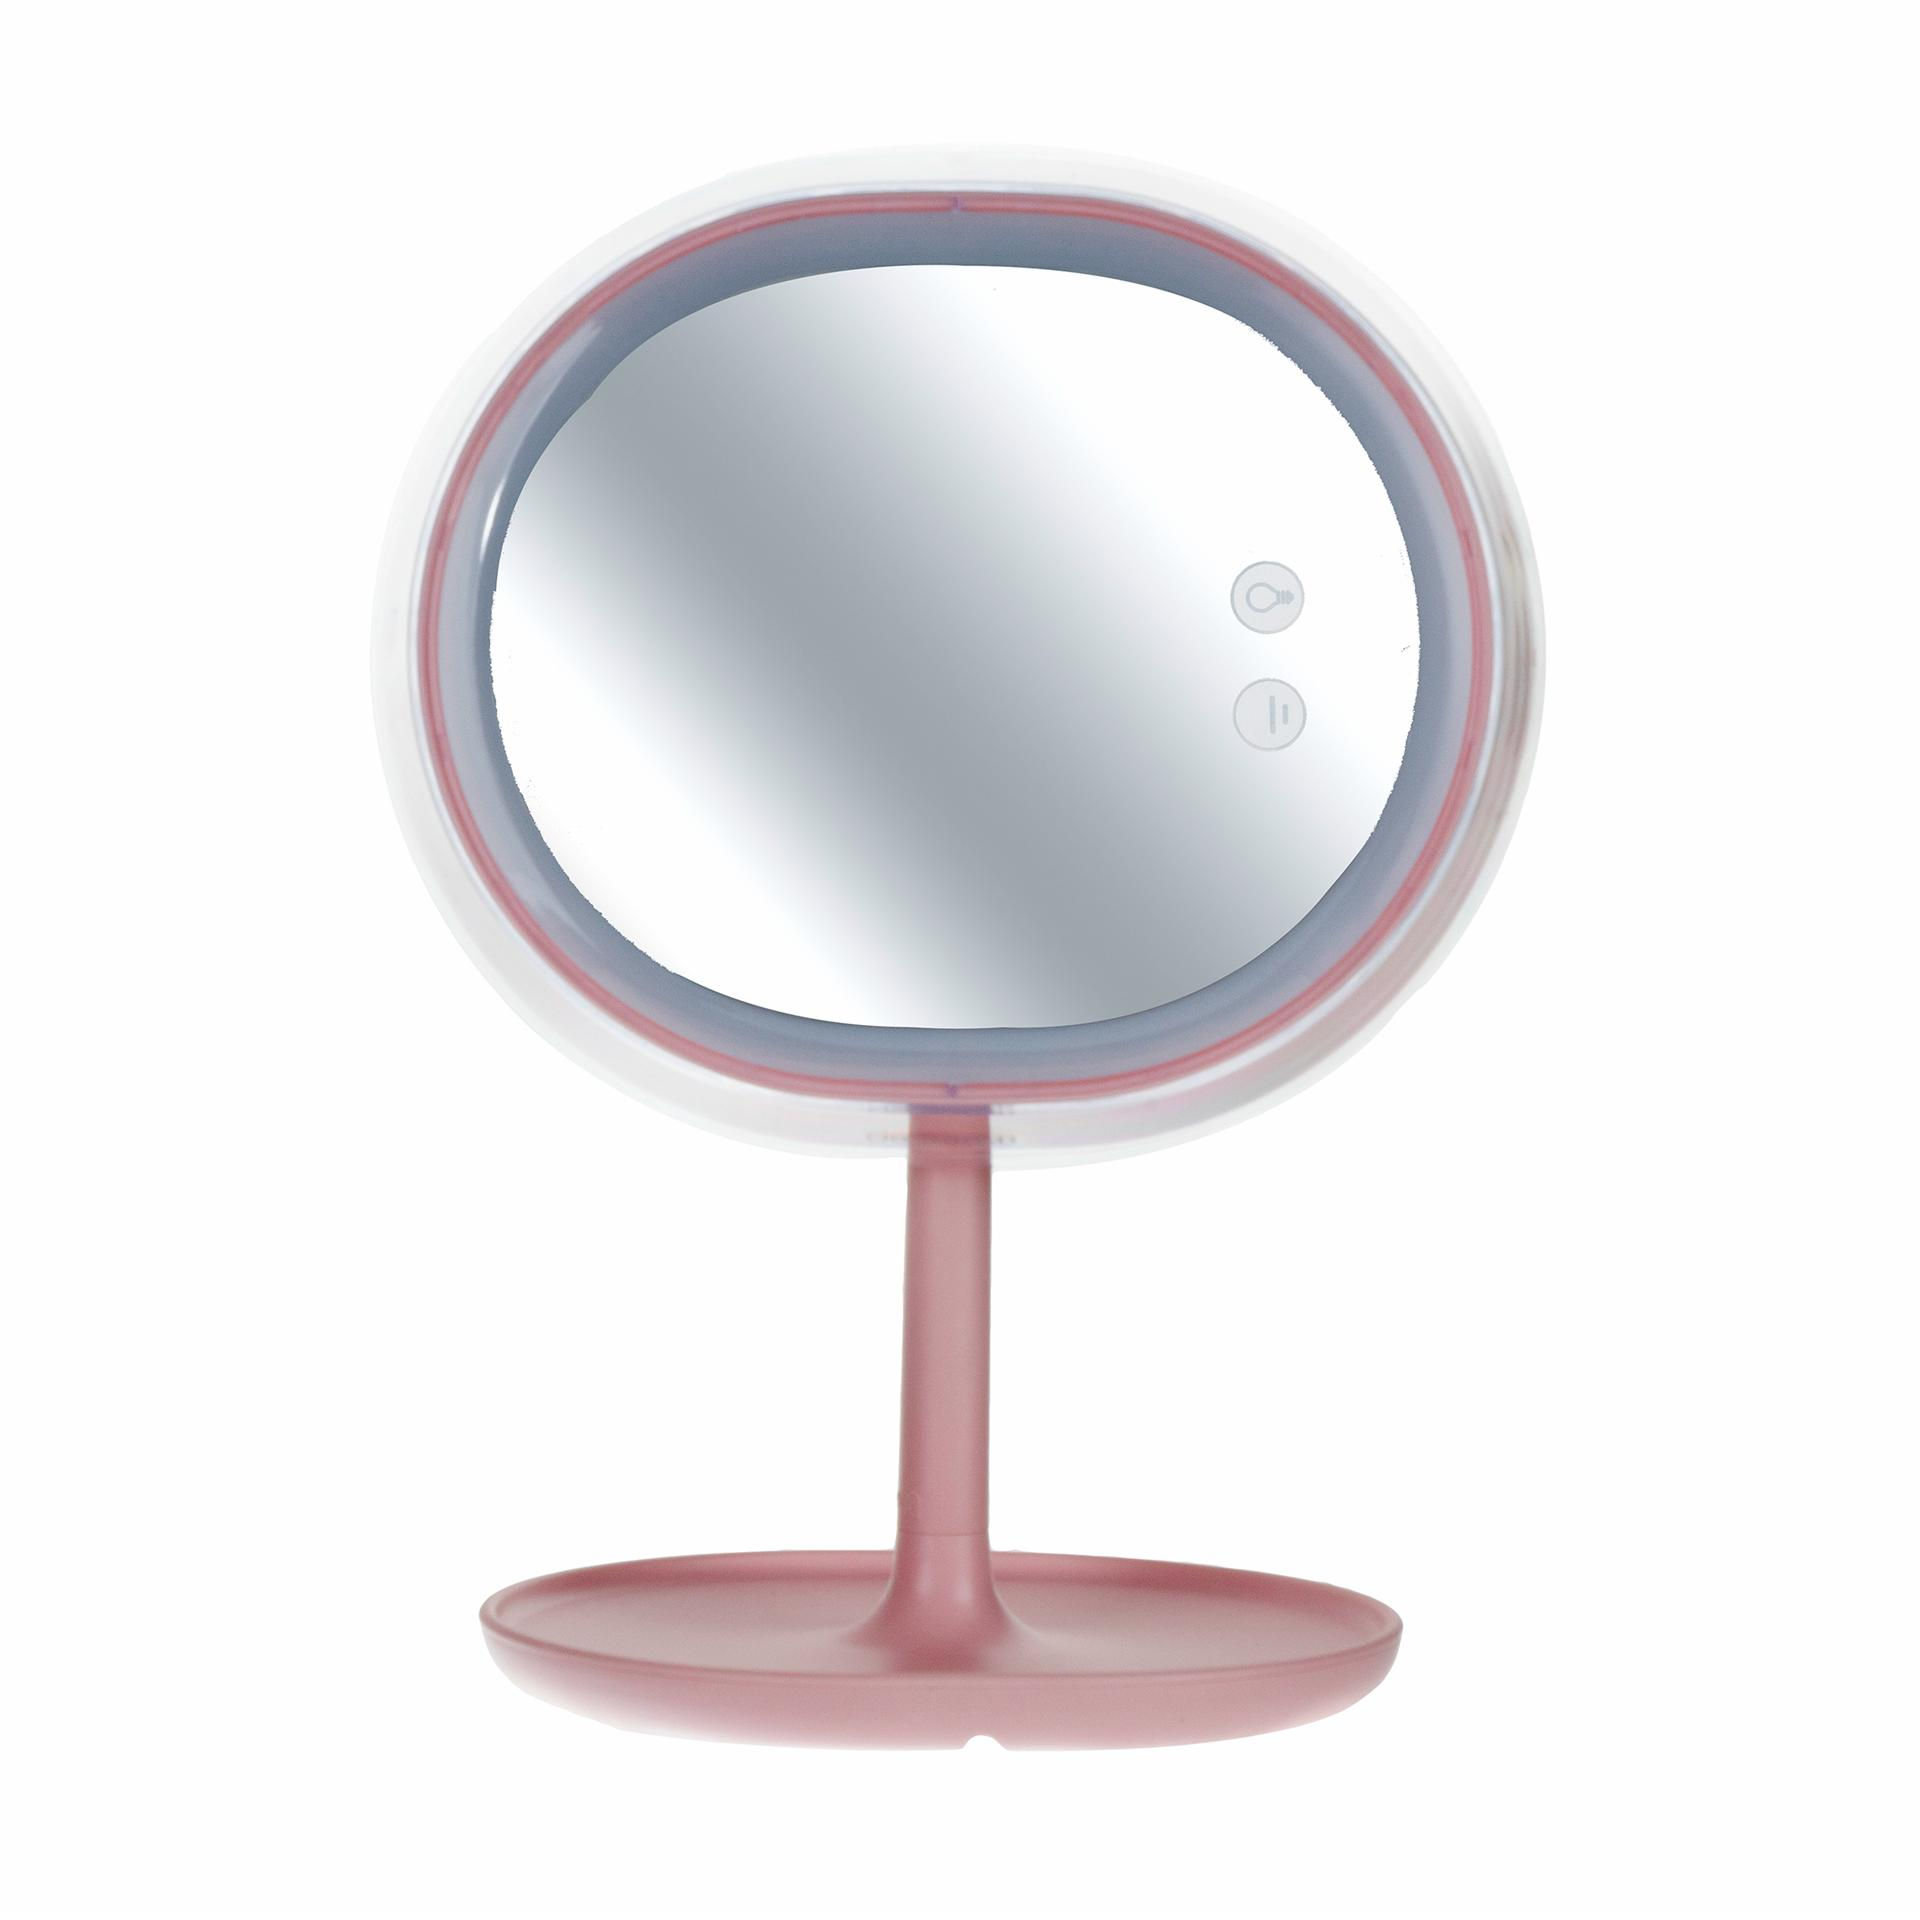 آینه آرایشی جوی روم مدل JR-CY266